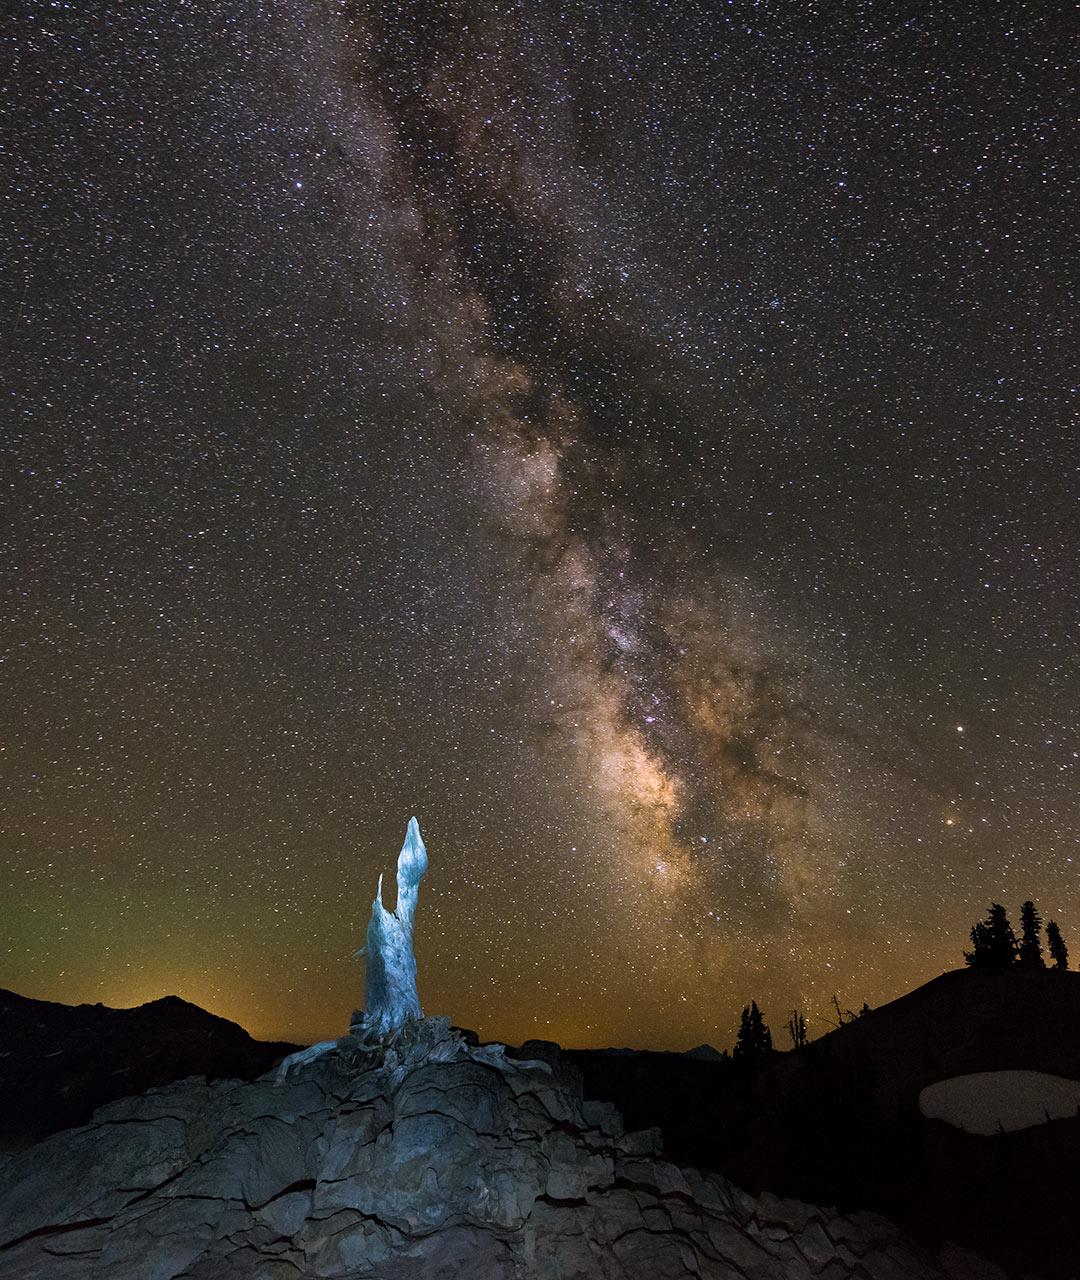 night-sky-photography-Crater-Lake-Milky-Way-blue-snag